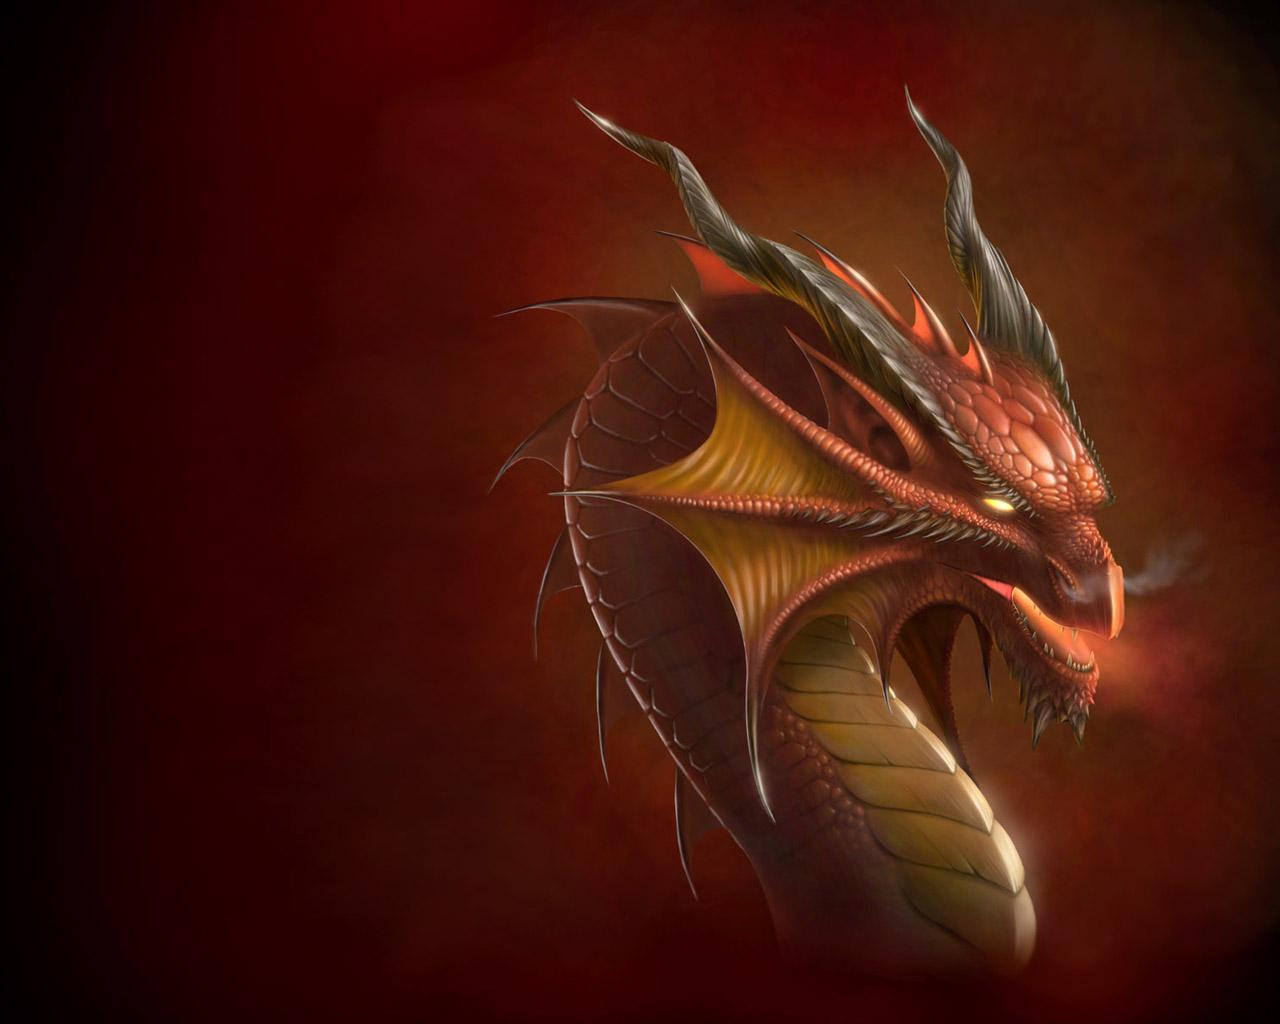 Dragon head Wallpaper